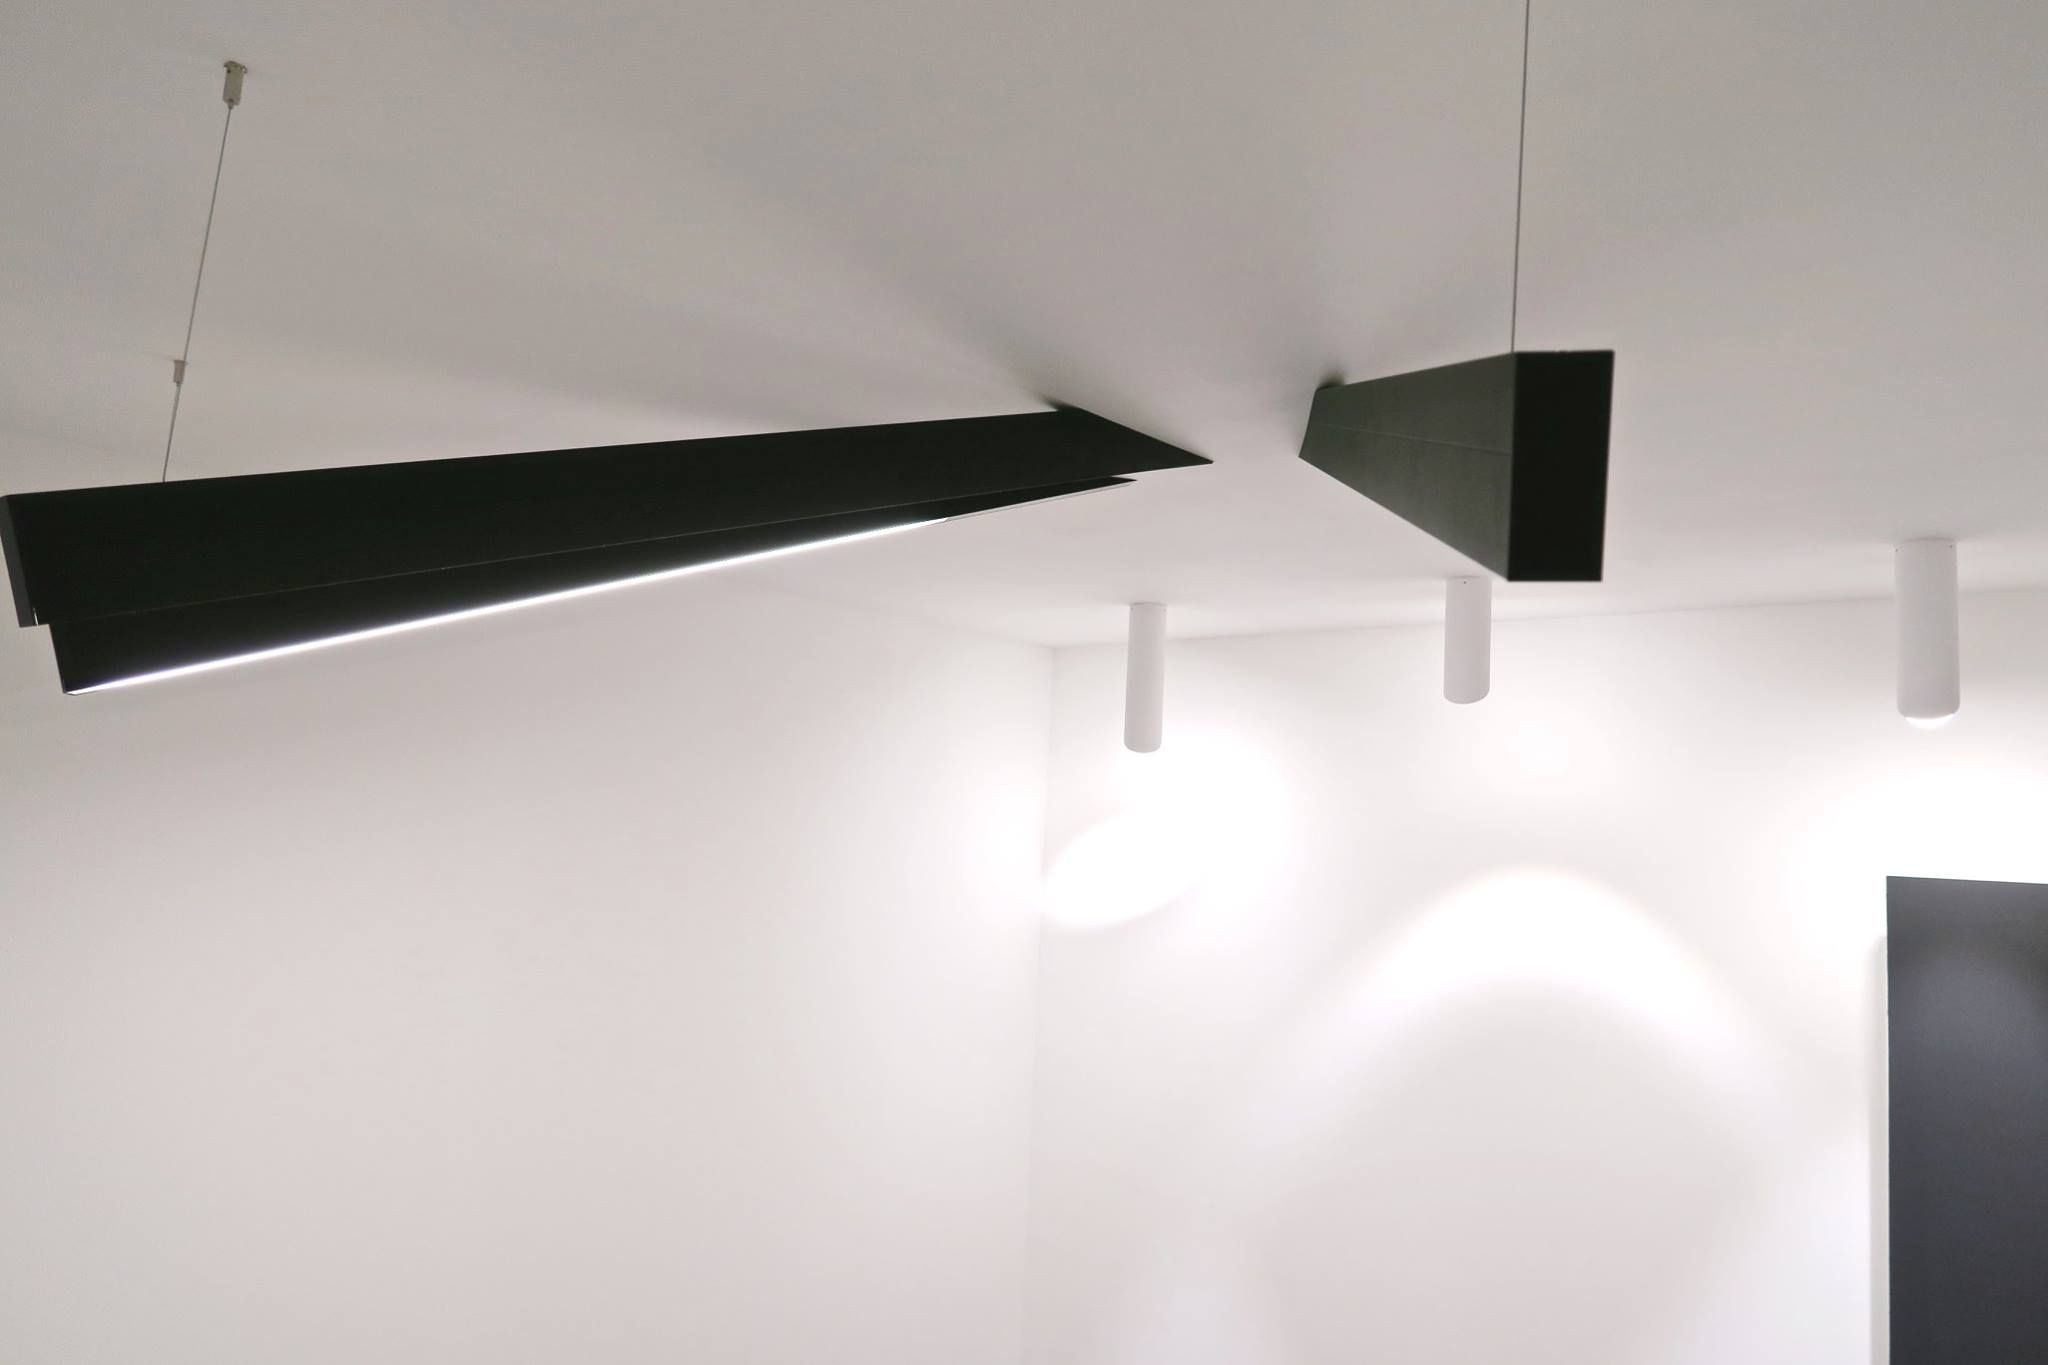 Angle Beam Dark Lighting Anthony Boelaert For Dark Architecturallighting Led Design Darling Verlichting